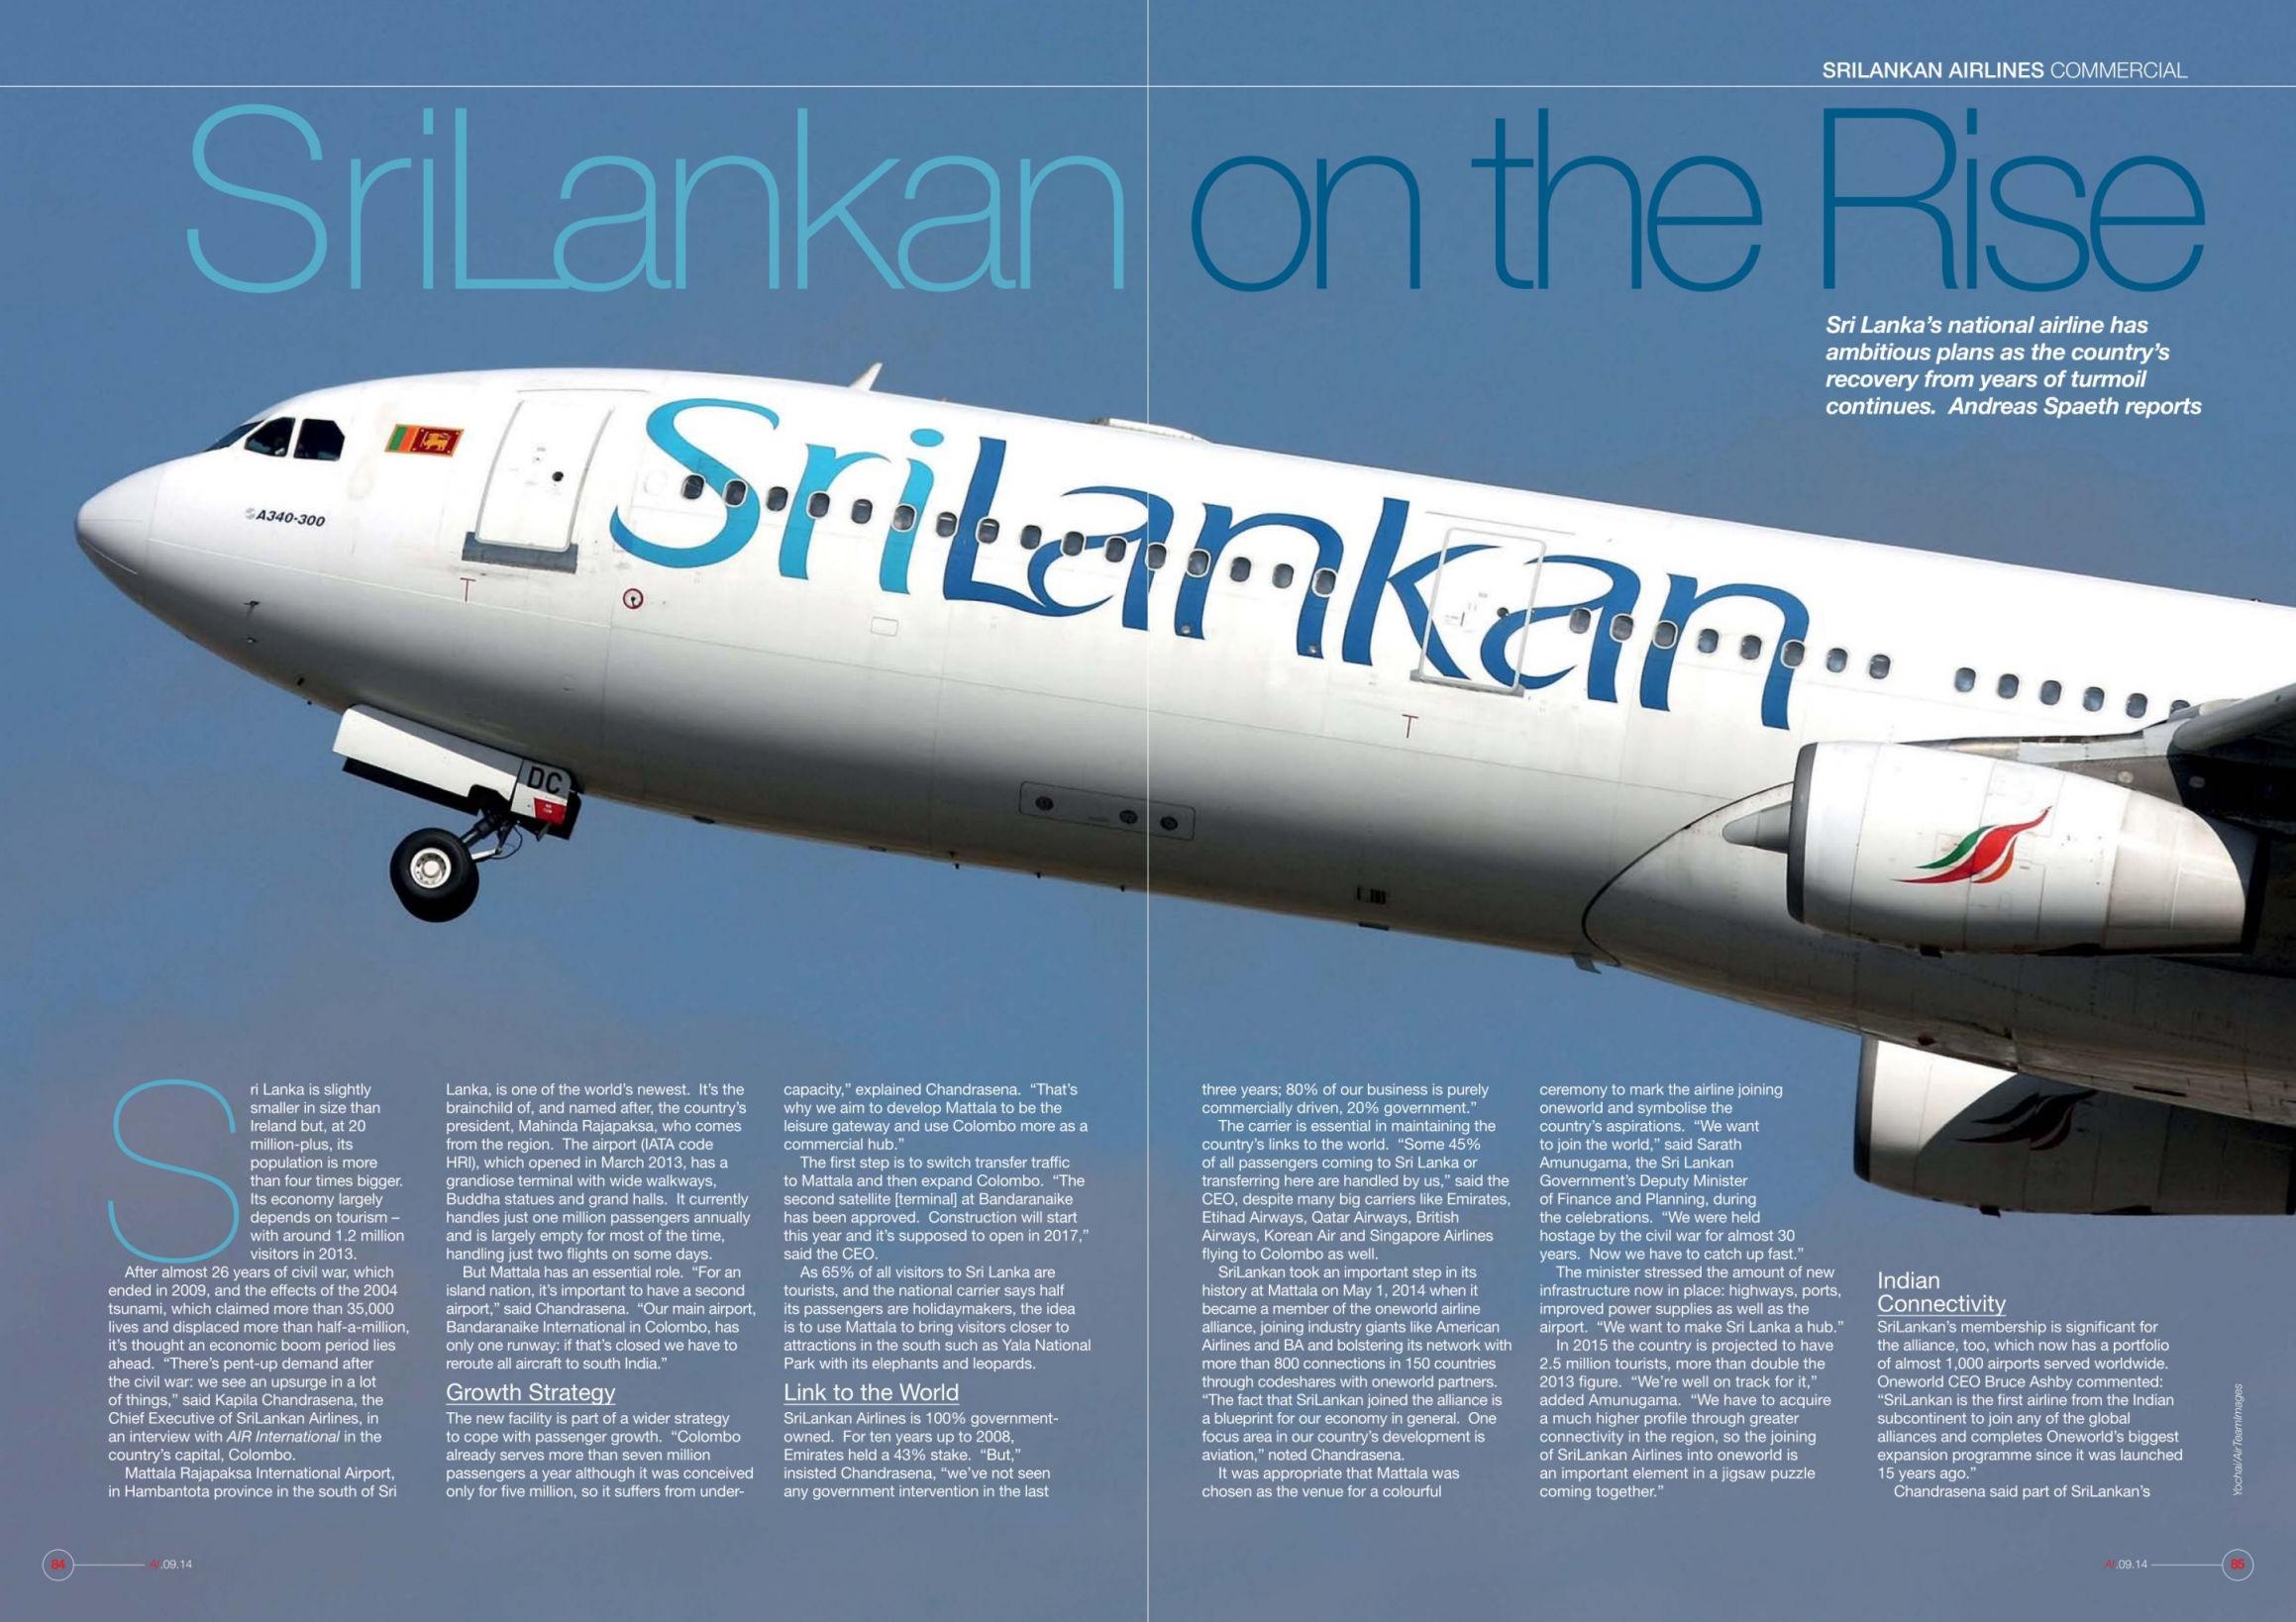 srilankan airlines marketing mis strategies